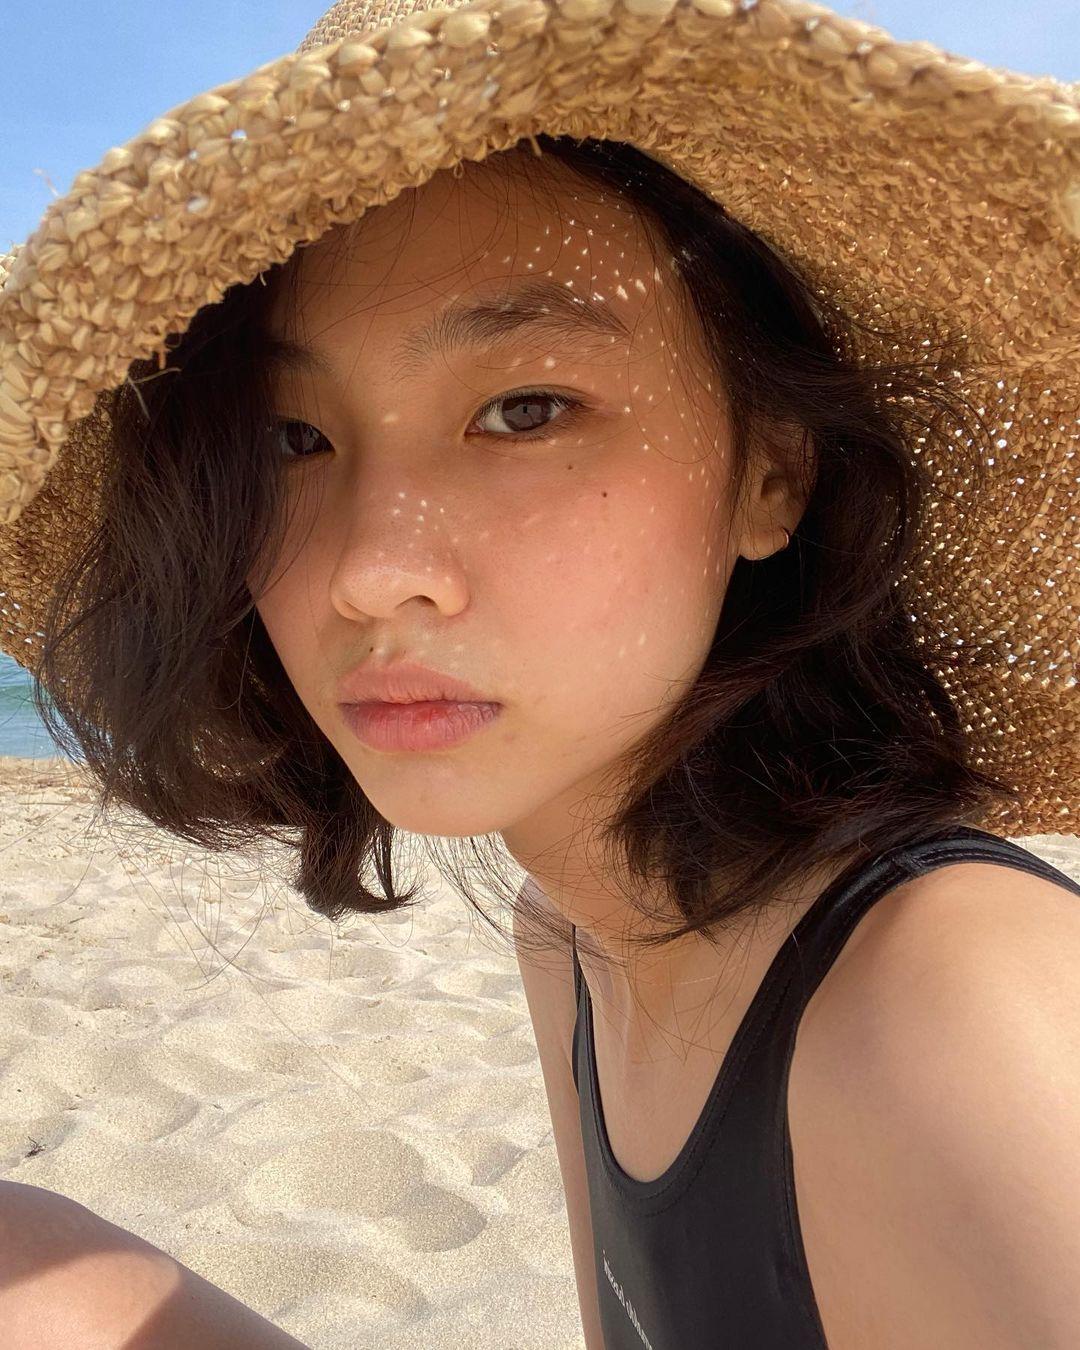 Squid Game cast's Instagram accounts - Jung Ho Yeon